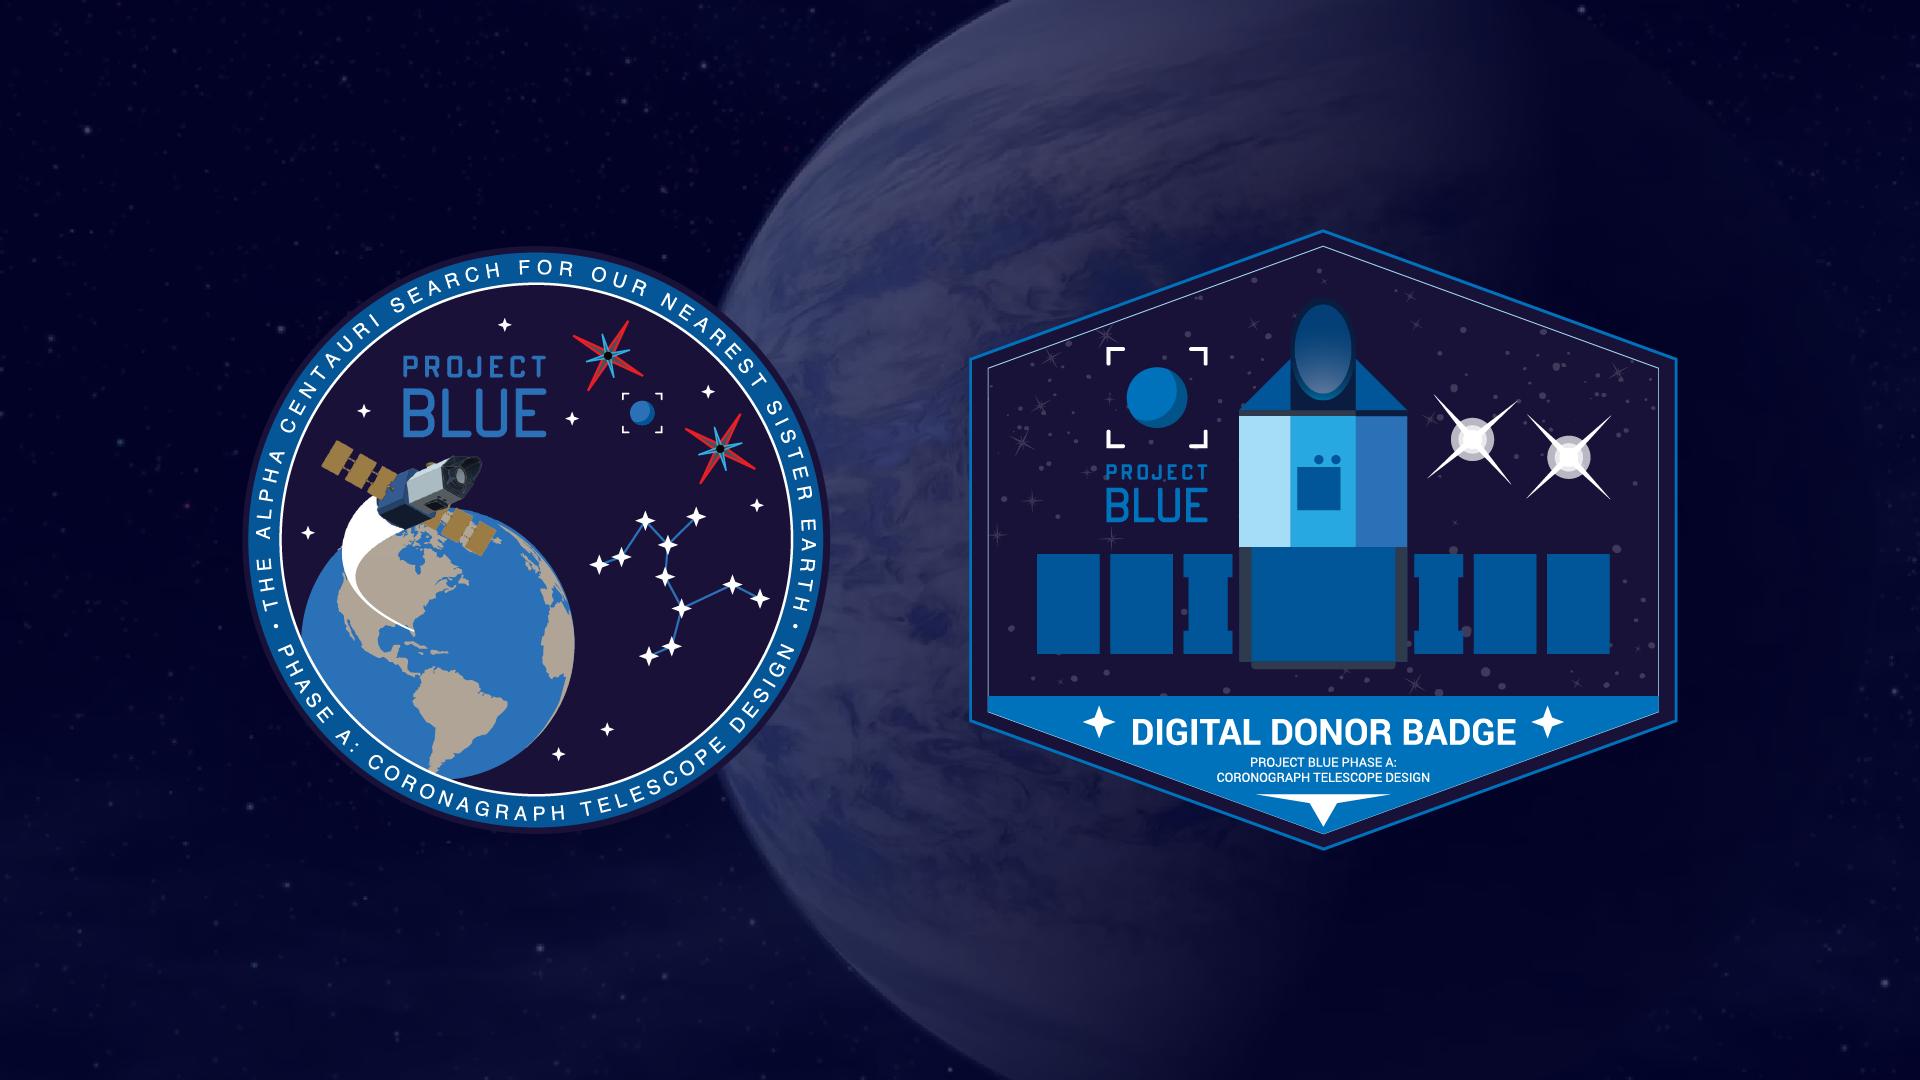 Project Blue Digital Donor Badge Widescreen Wallpaper